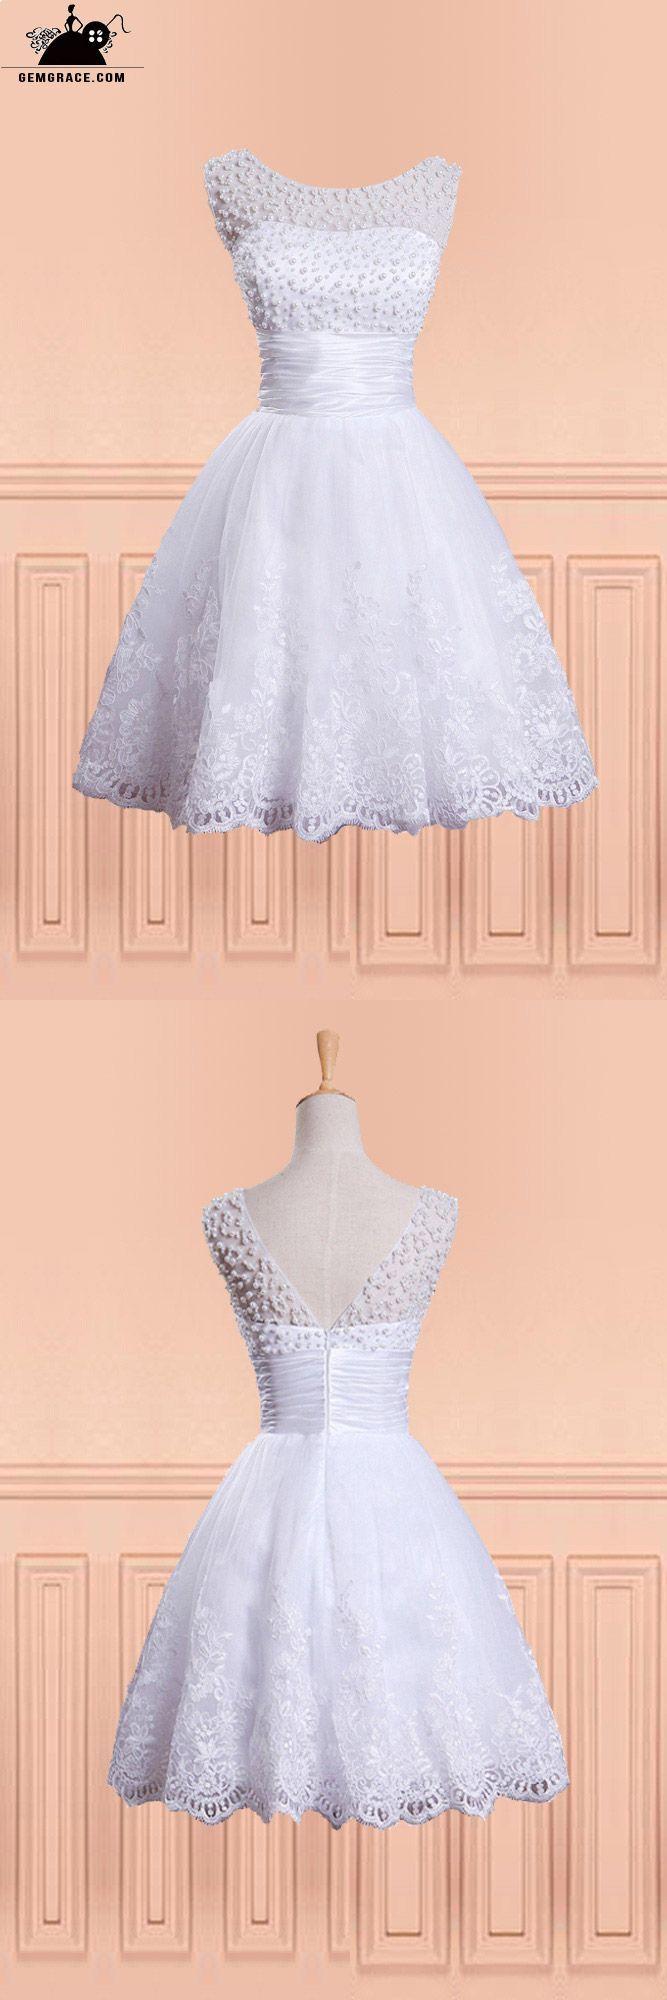 138 99 Vintage Chic Beaded Pearls Fun Short Wedding Dress With Beading Round Neck E9853 Gemgrace Com Short Wedding Dress Short Wedding Dress Vintage Short Wedding Dress Beach [ 2000 x 667 Pixel ]